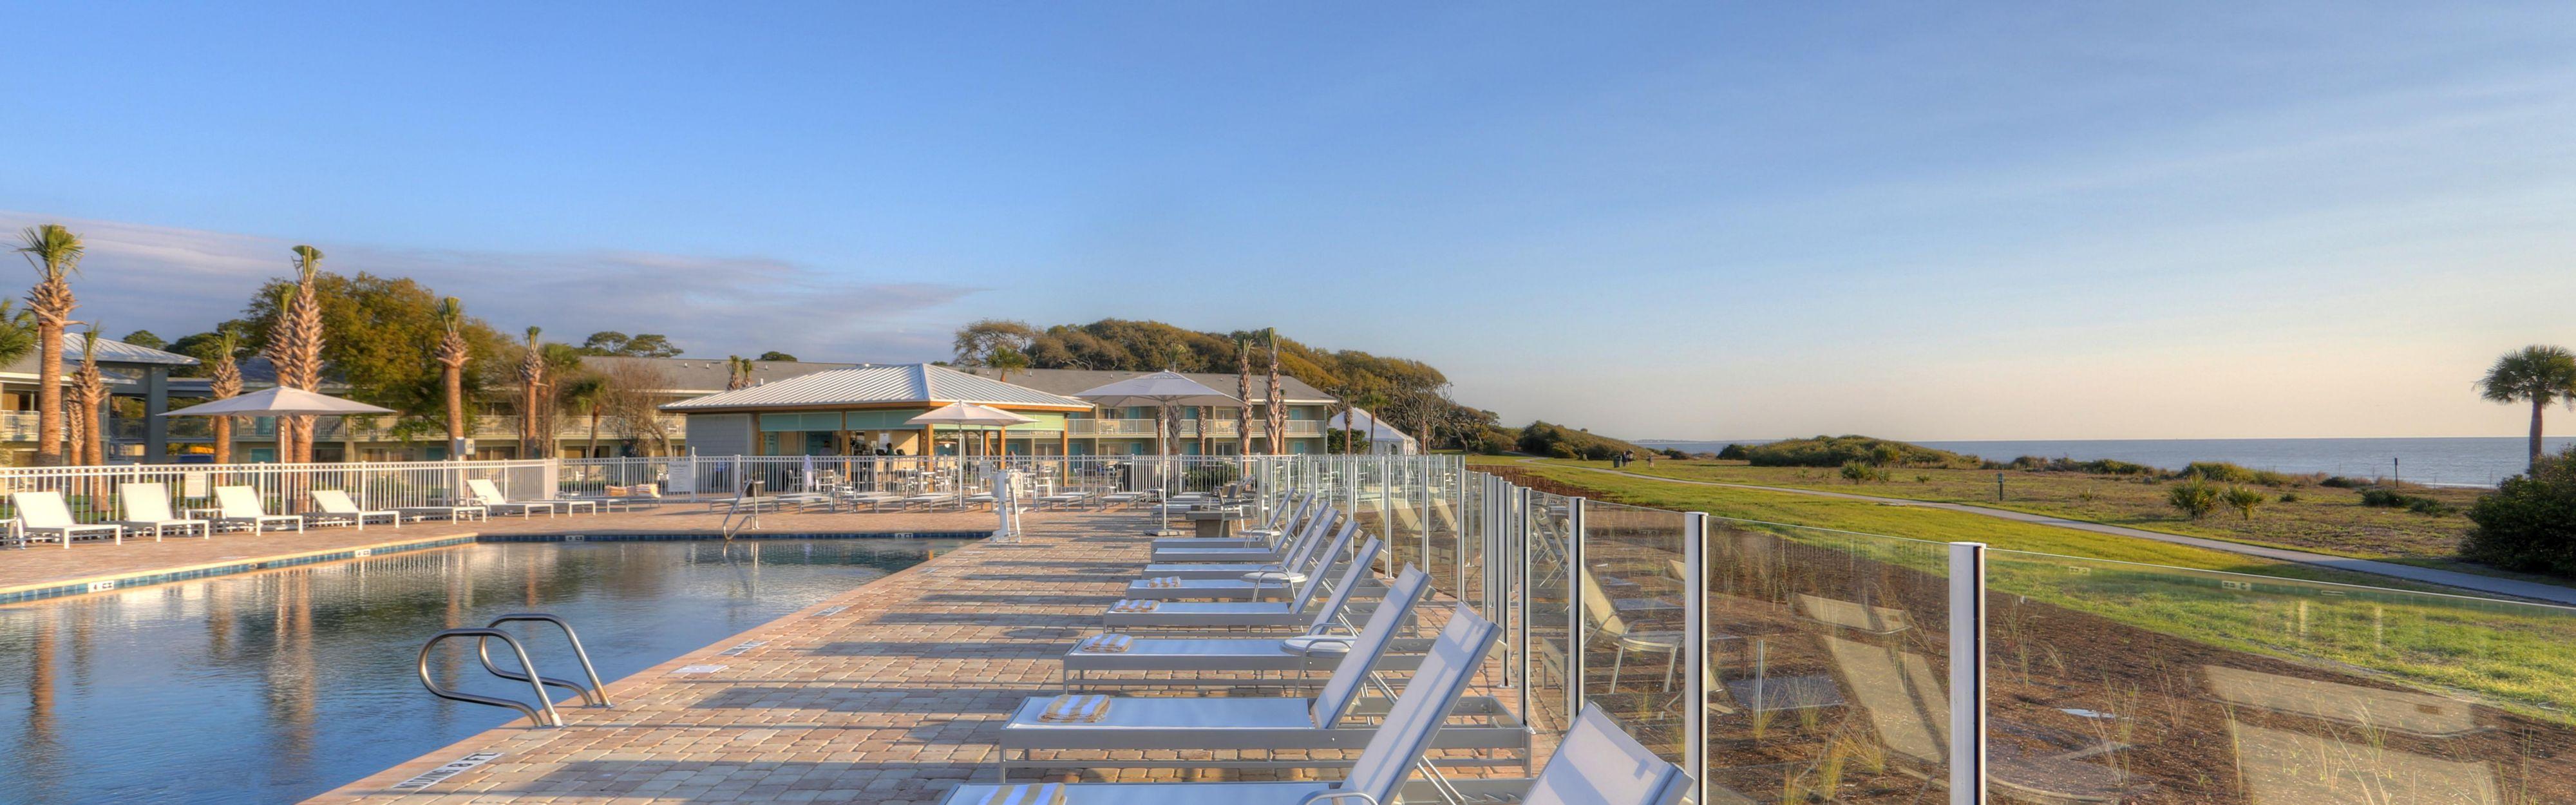 Holiday Inn Resort Jekyll Island image 2